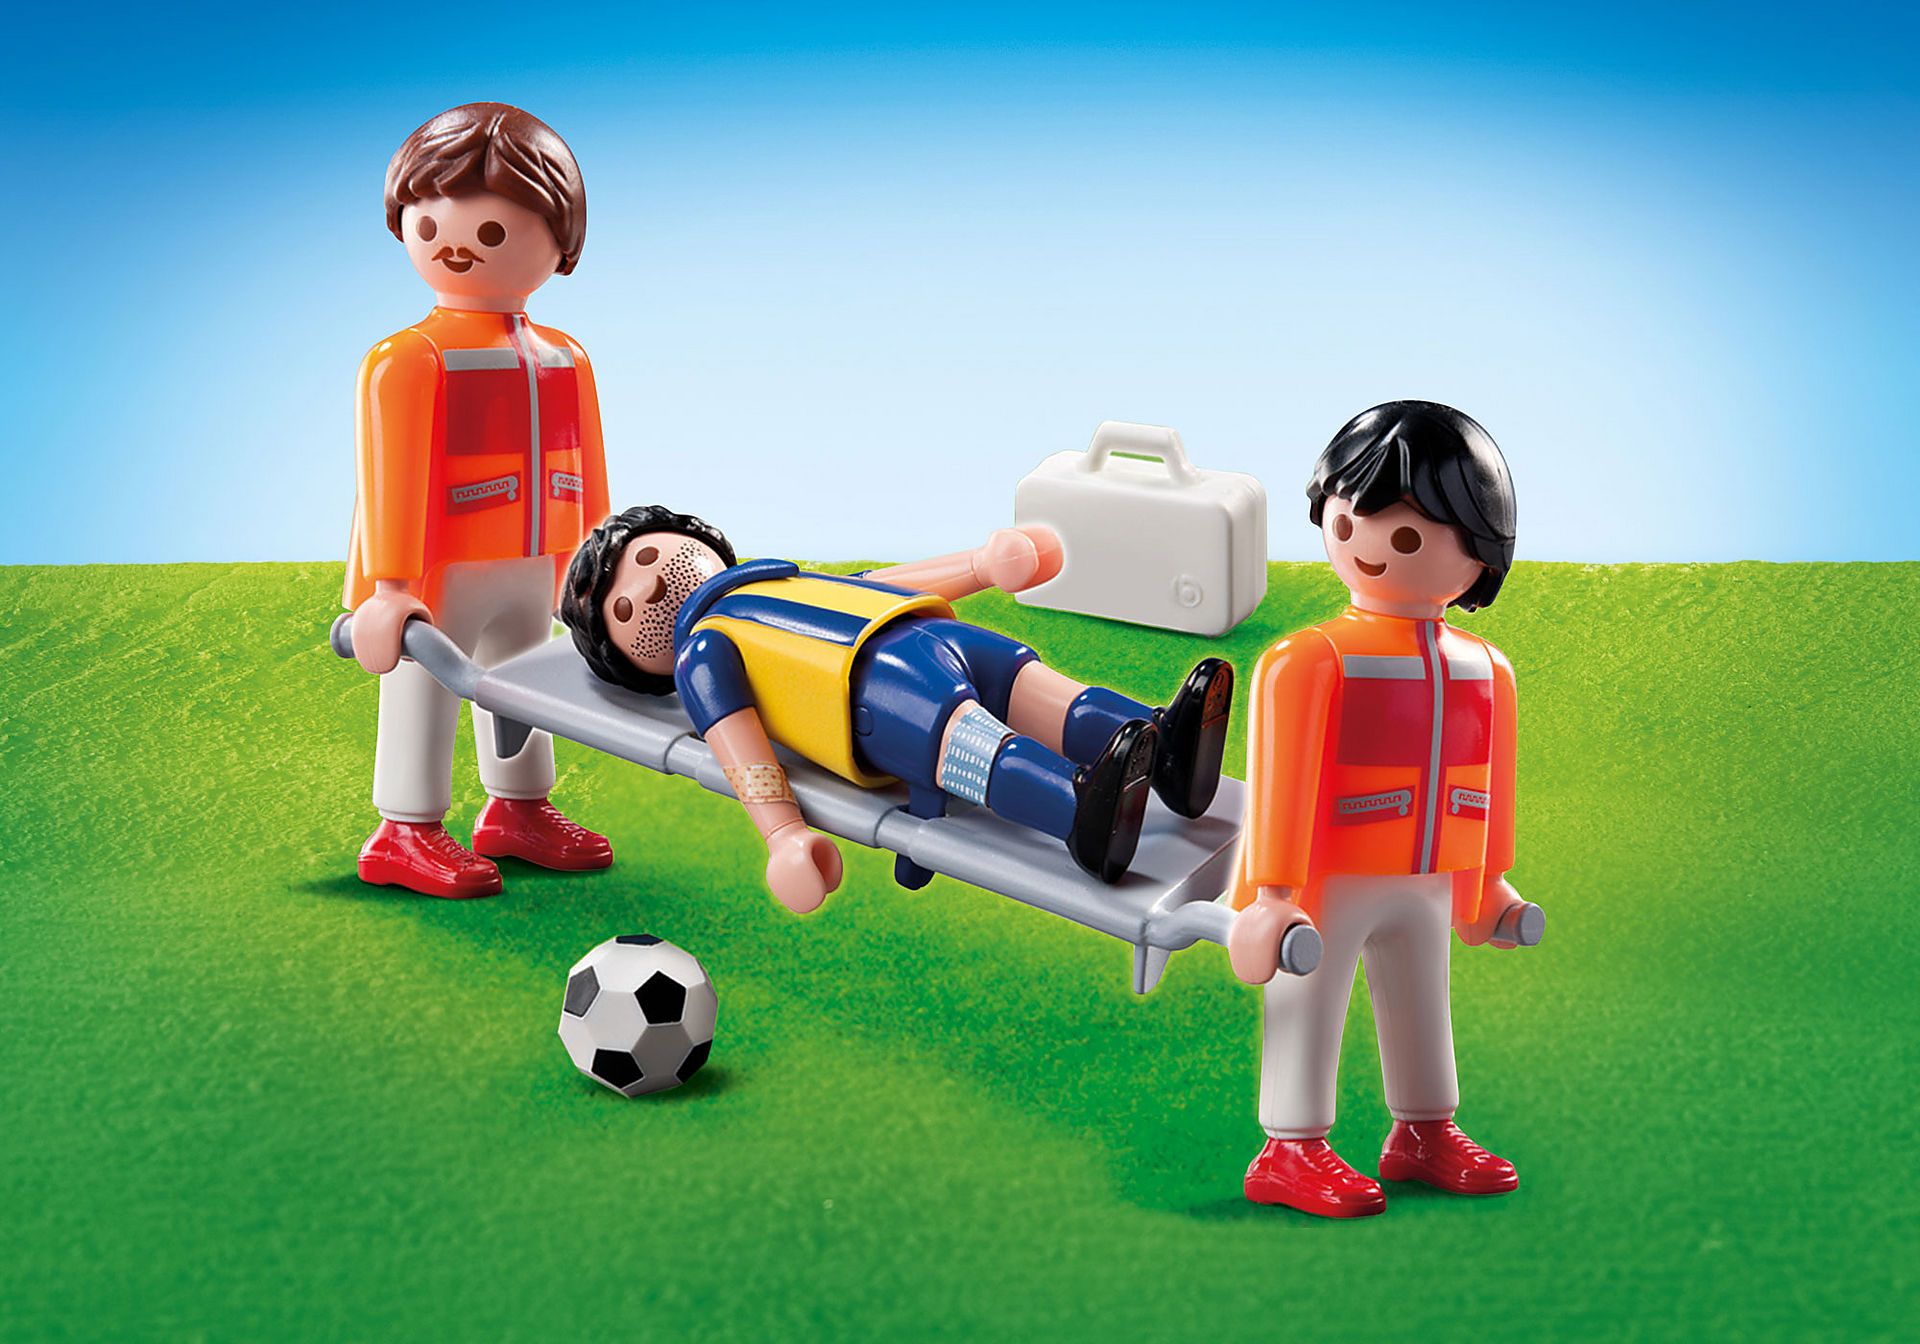 http://media.playmobil.com/i/playmobil/9826_product_detail/Medische staf met voetballer